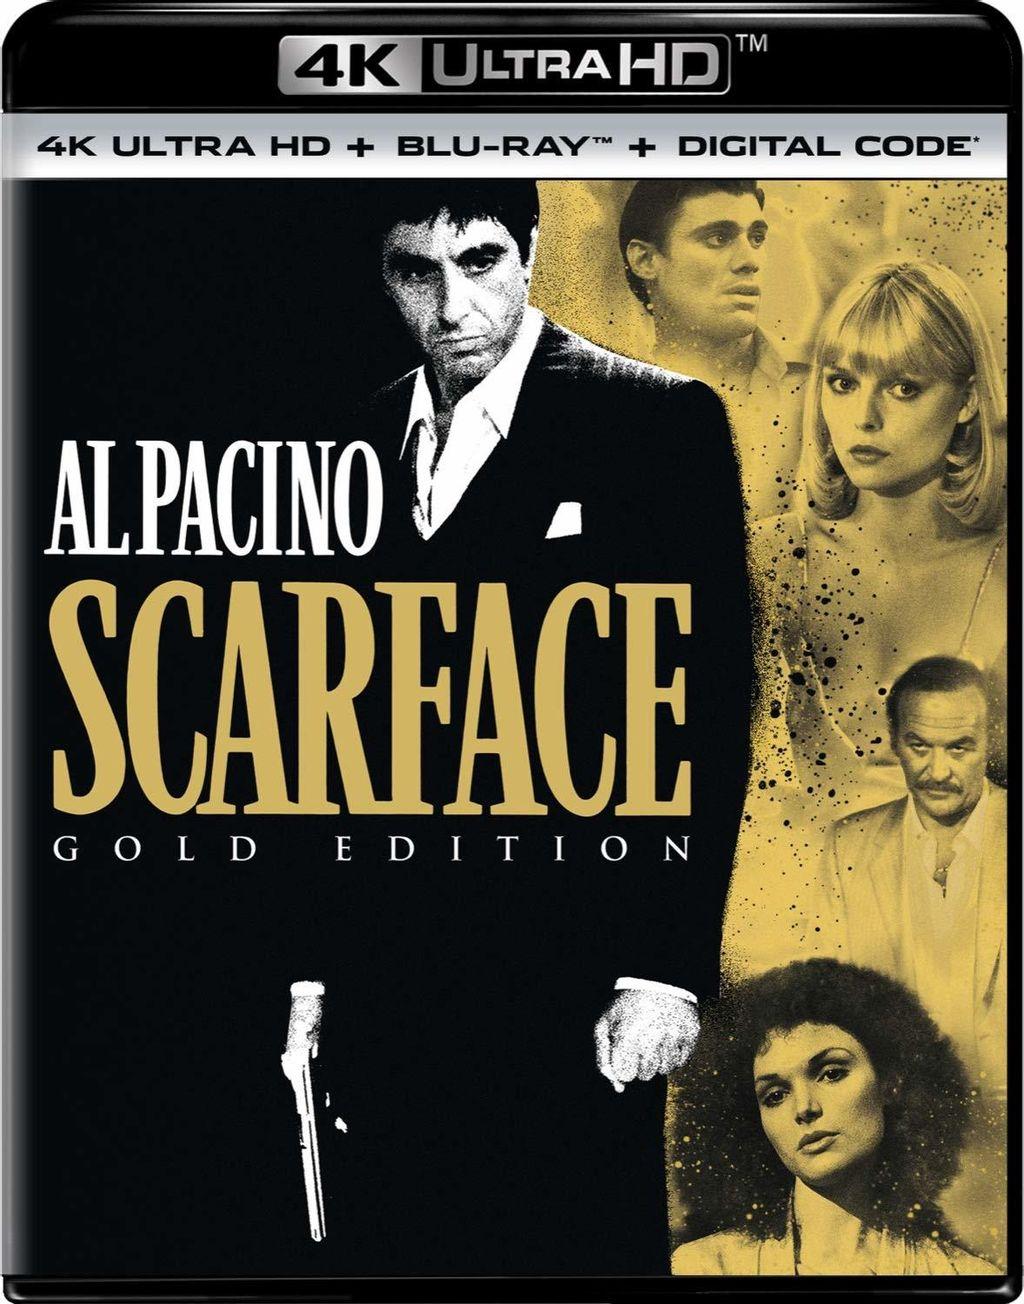 Scarface Gold Edition 4K Ultra HD Blu-ray Malaysia.jpg